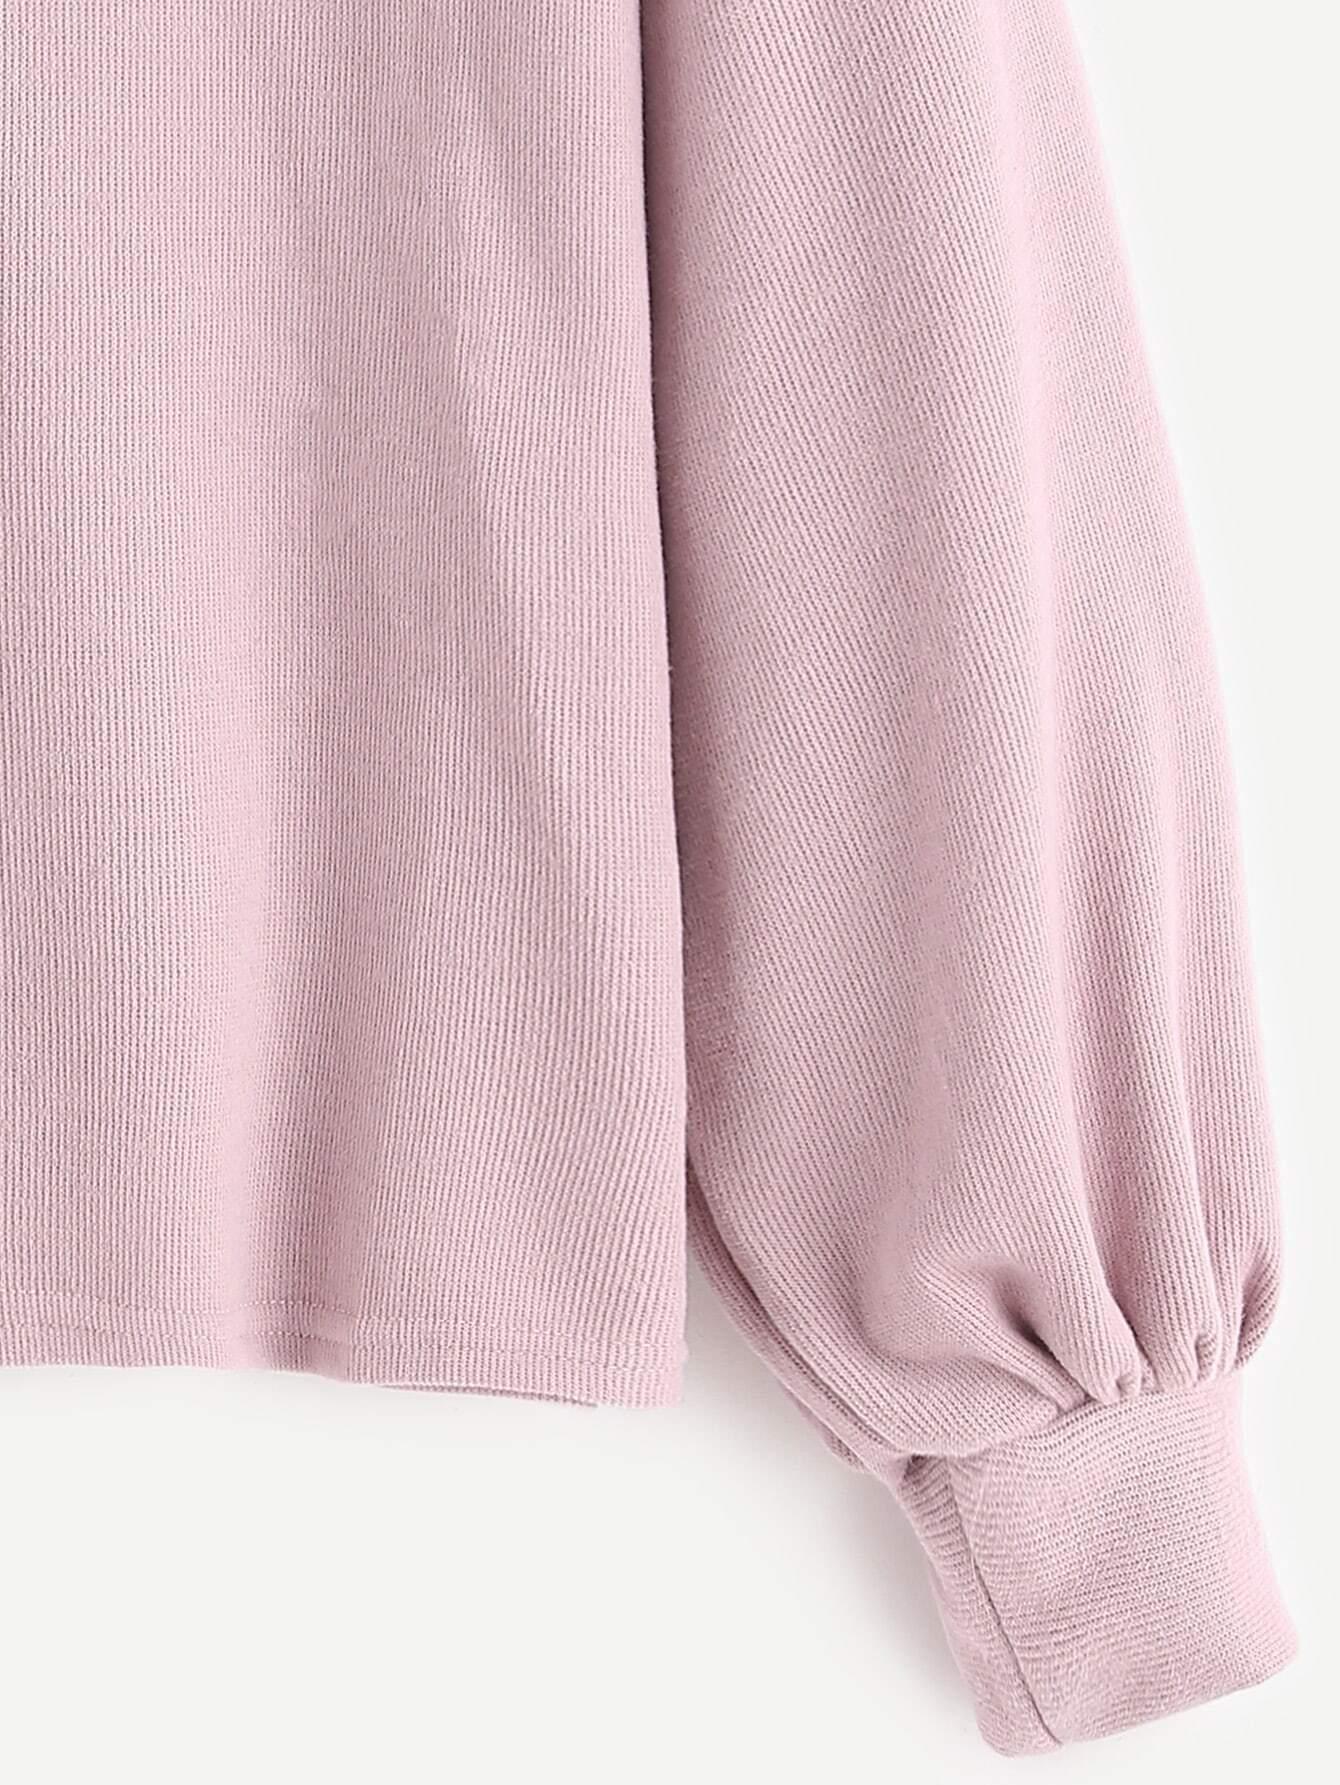 sweater161104003_2